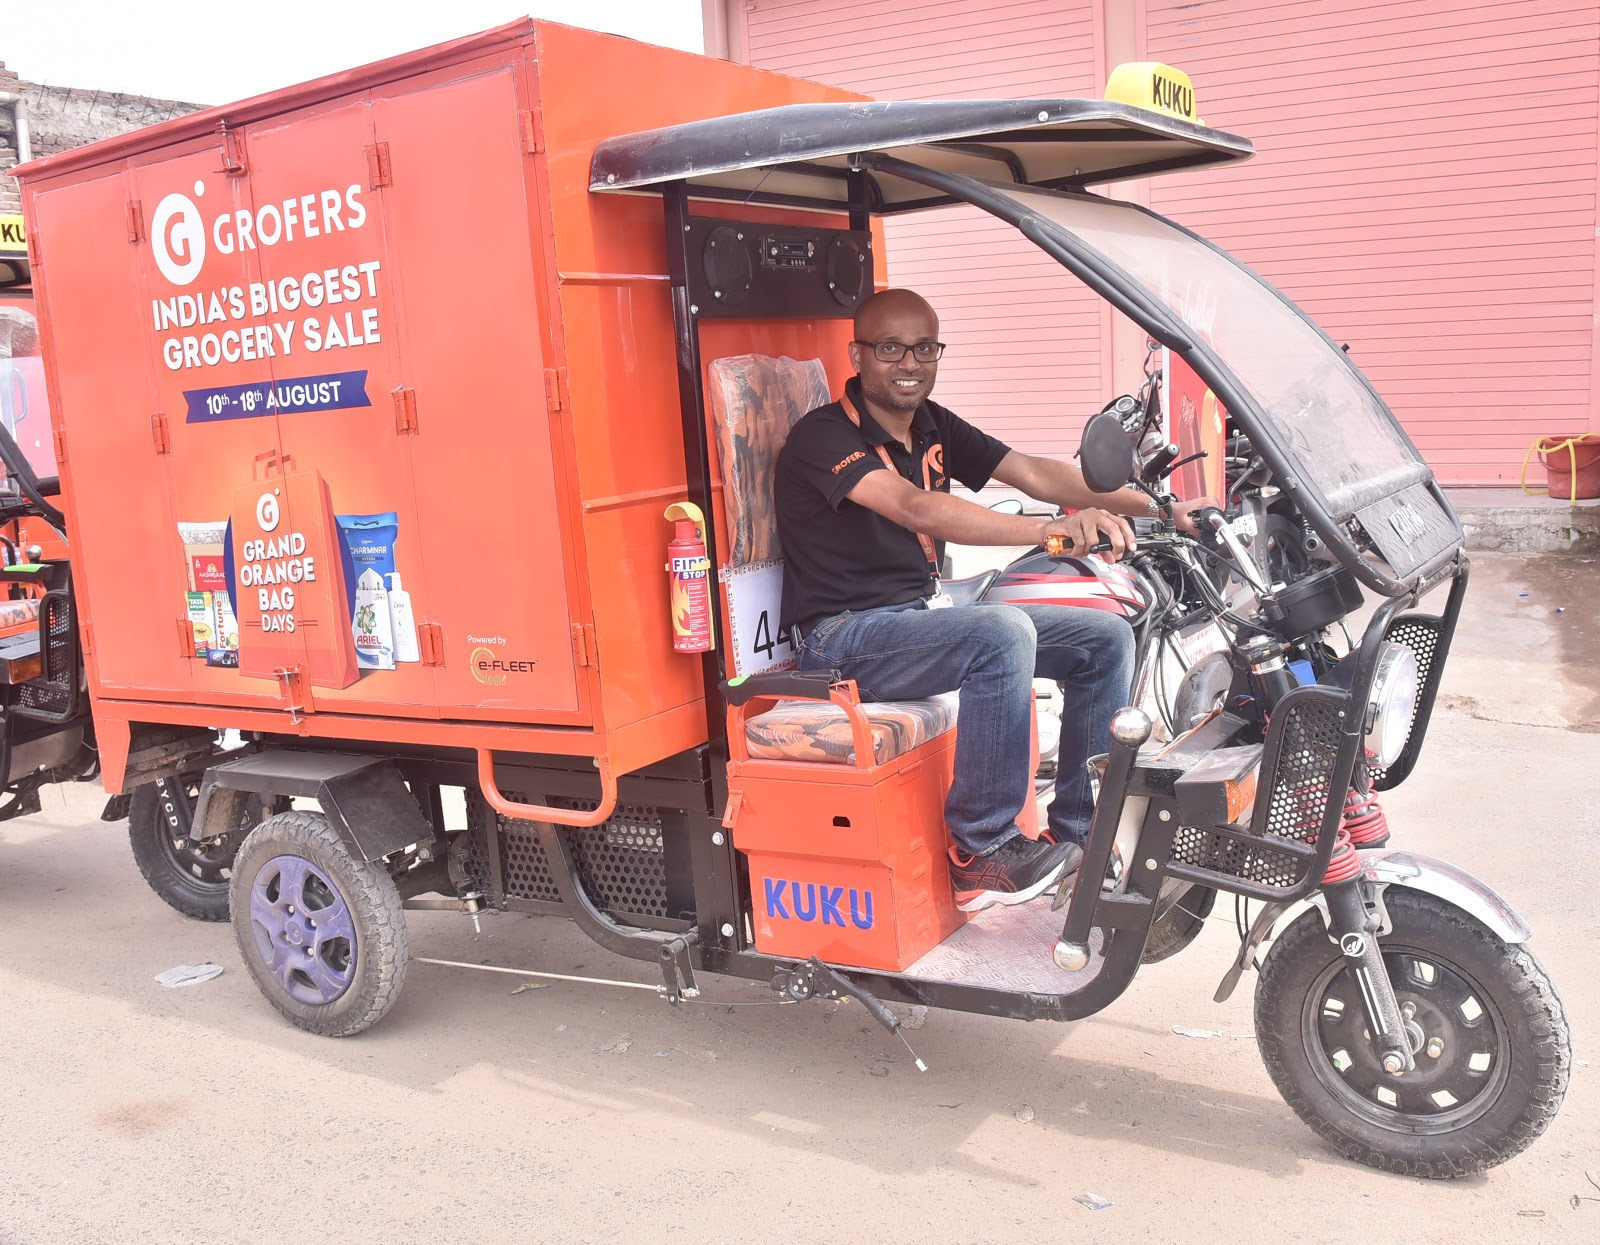 Mumbai News Network Latest News: Grofers adds sustainability